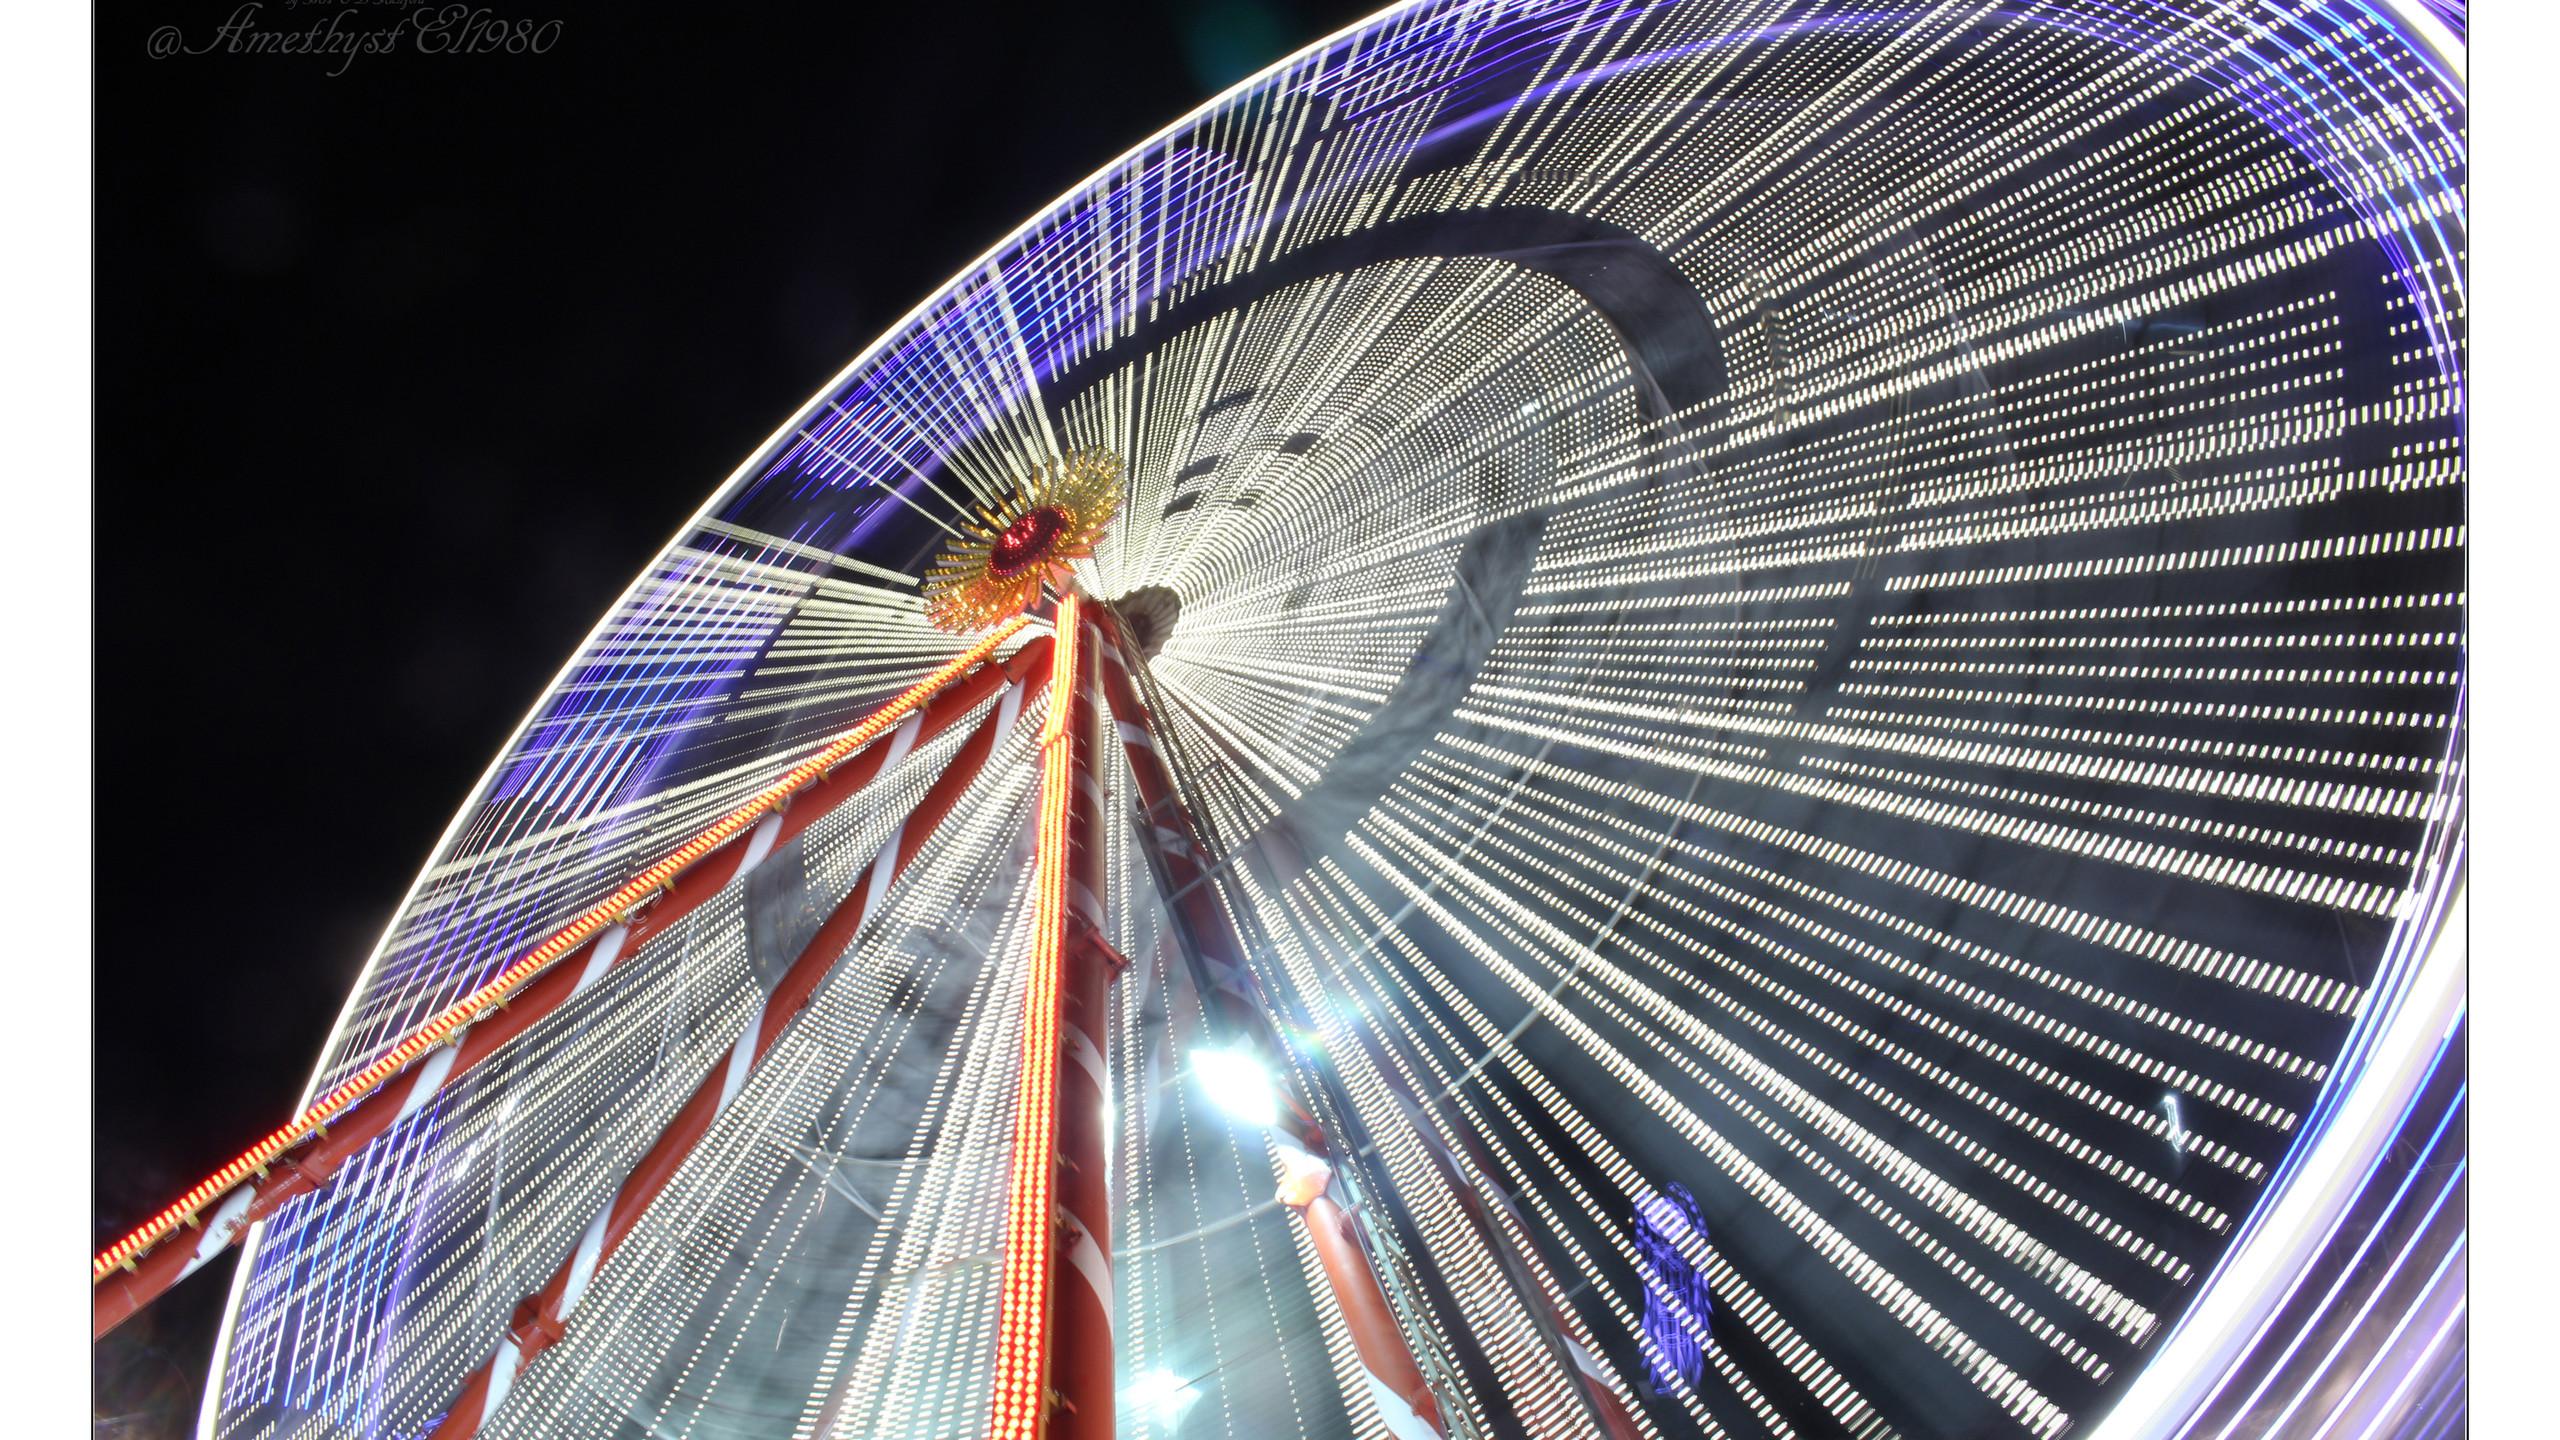 copy right Big Wheel